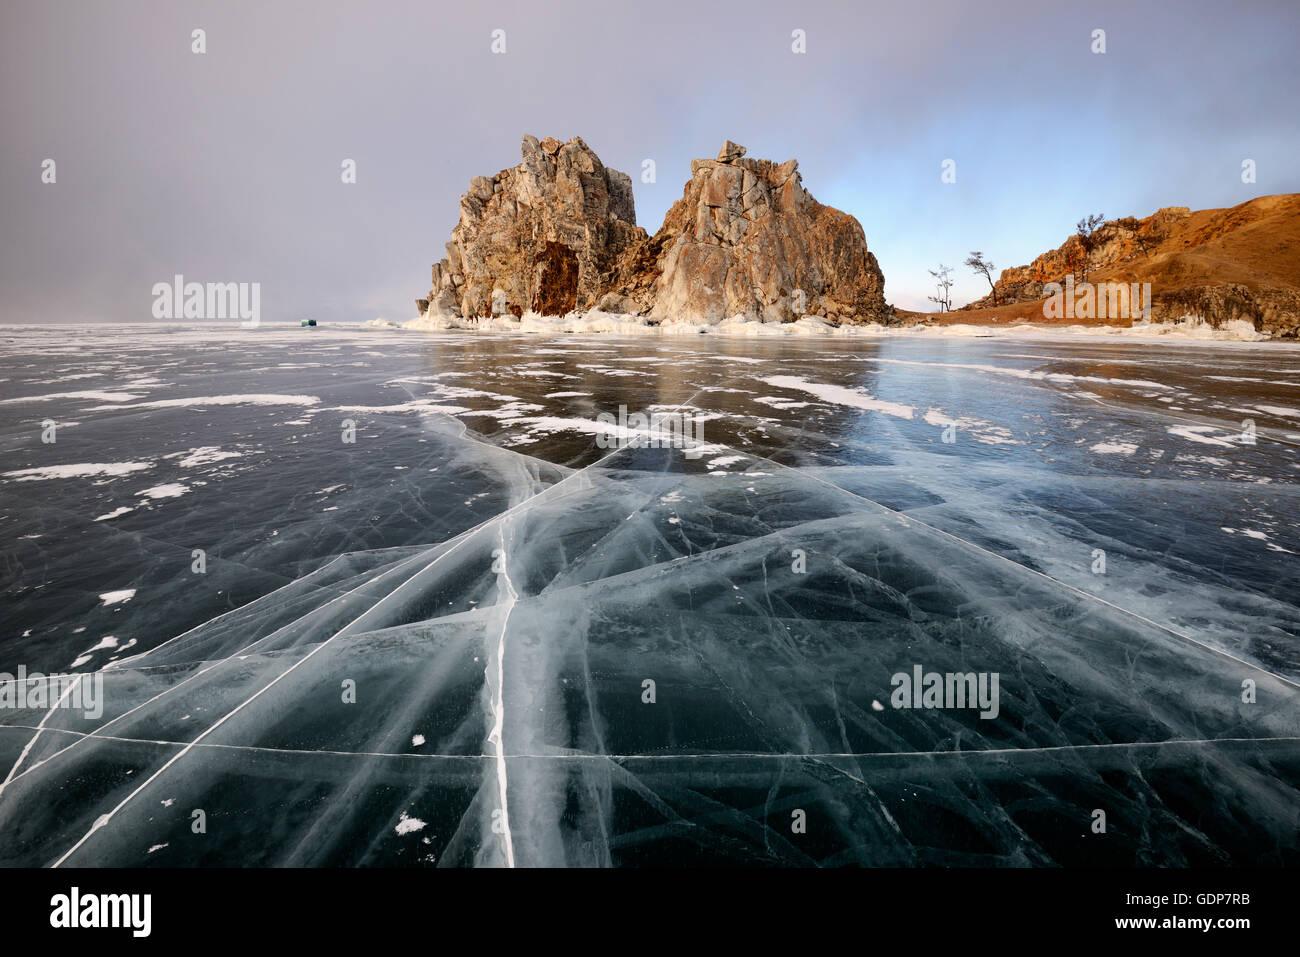 View of frozen ice and Shamanka Rock on Burkhan Cape, Baikal Lake, Olkhon Island, Siberia, Russia - Stock Image